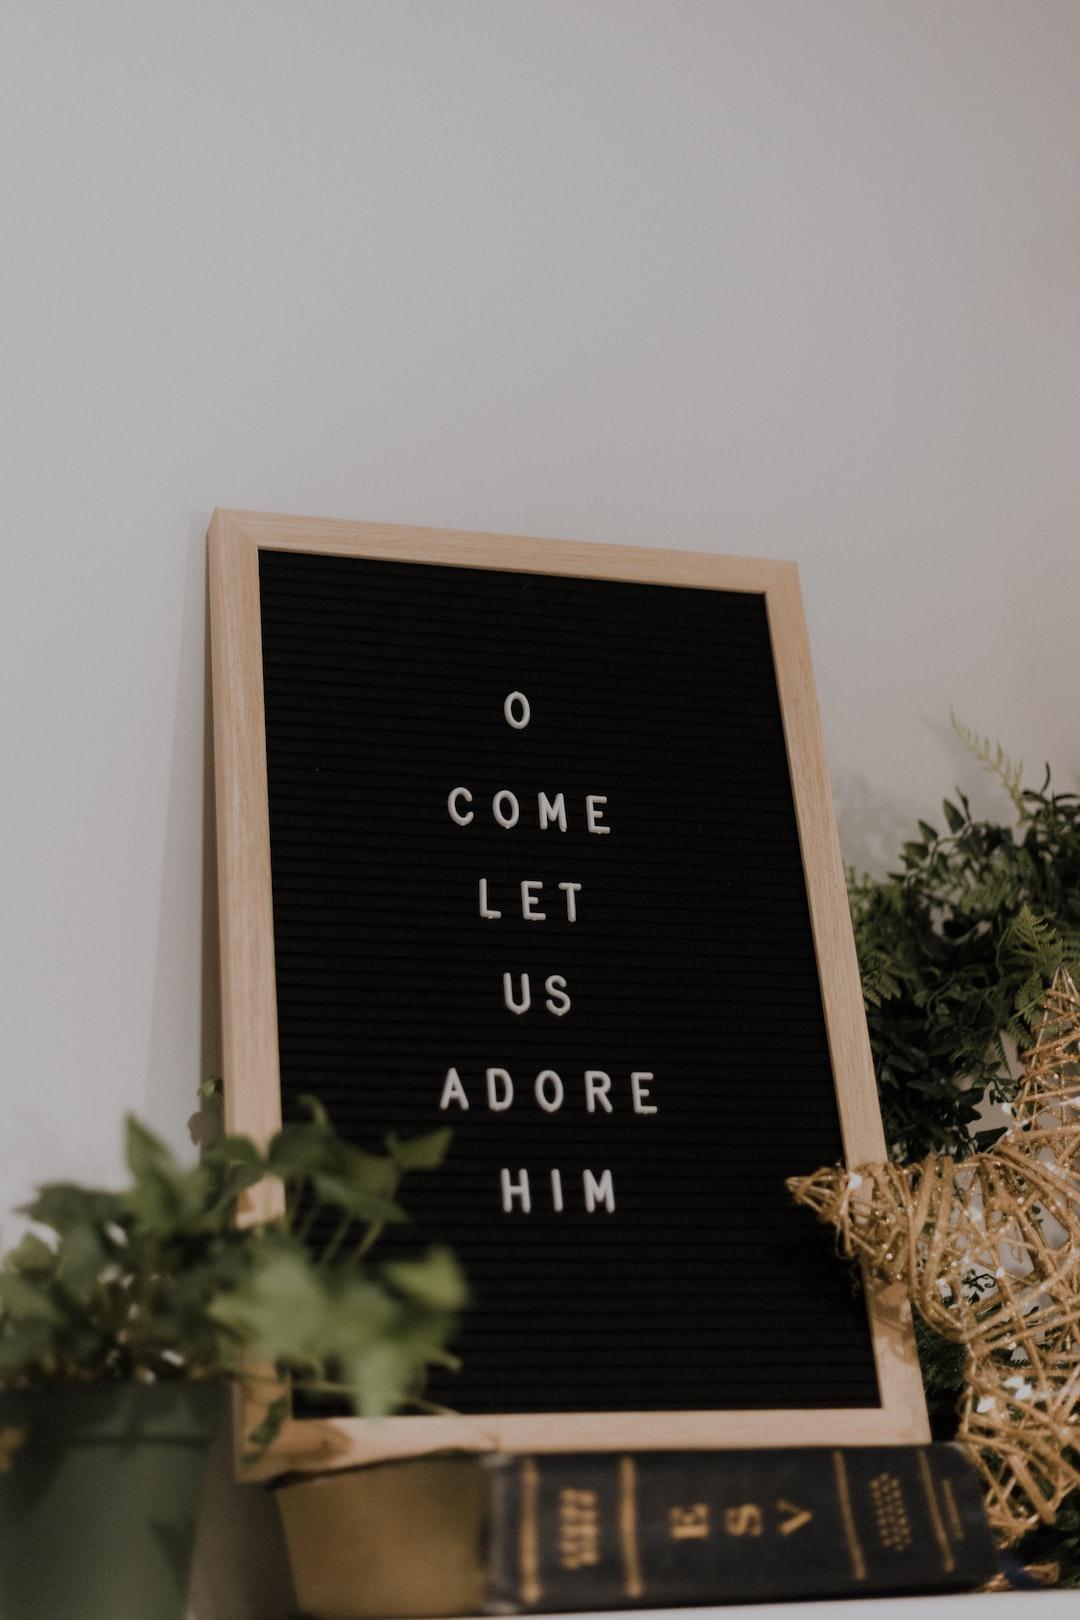 O come let us adore Him letterboard quote